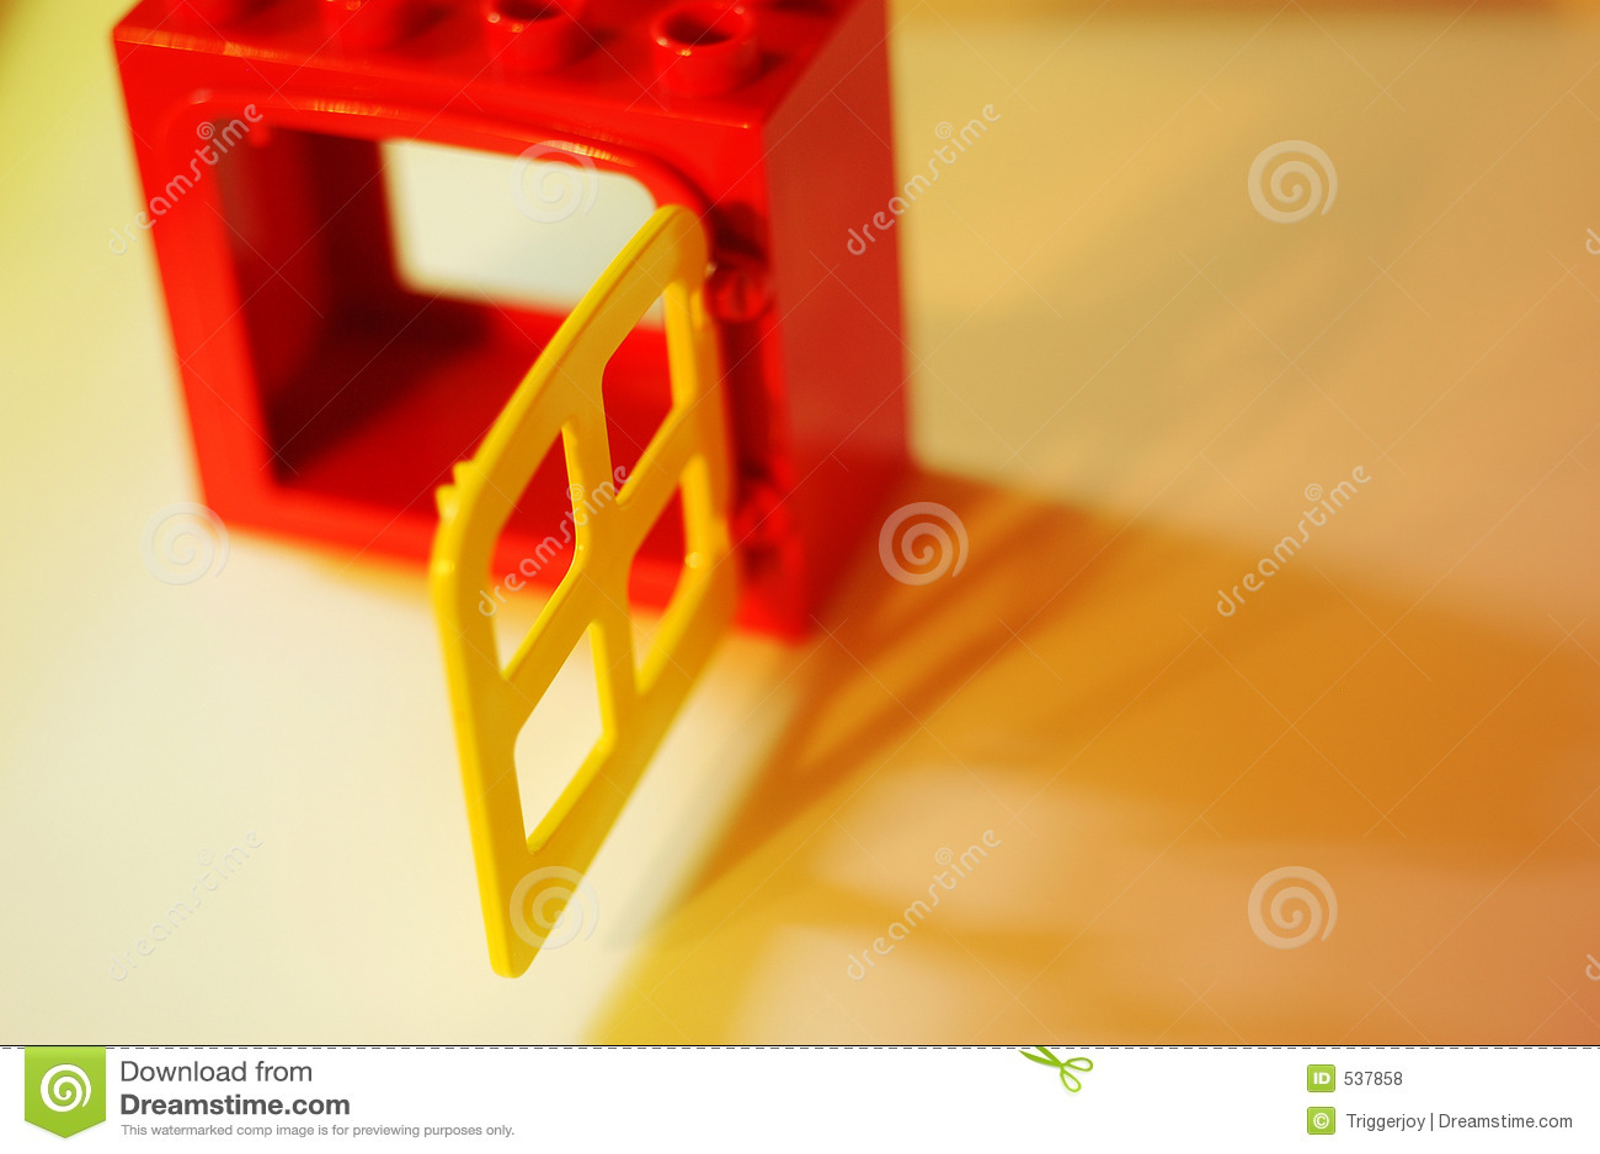 Download 机会视窗 库存照片. 图片 包括有 商业, 开放, 红色, 金黄, 玩具, 象征性, 视窗, 黄色, 隐喻, 概念性 - 537858